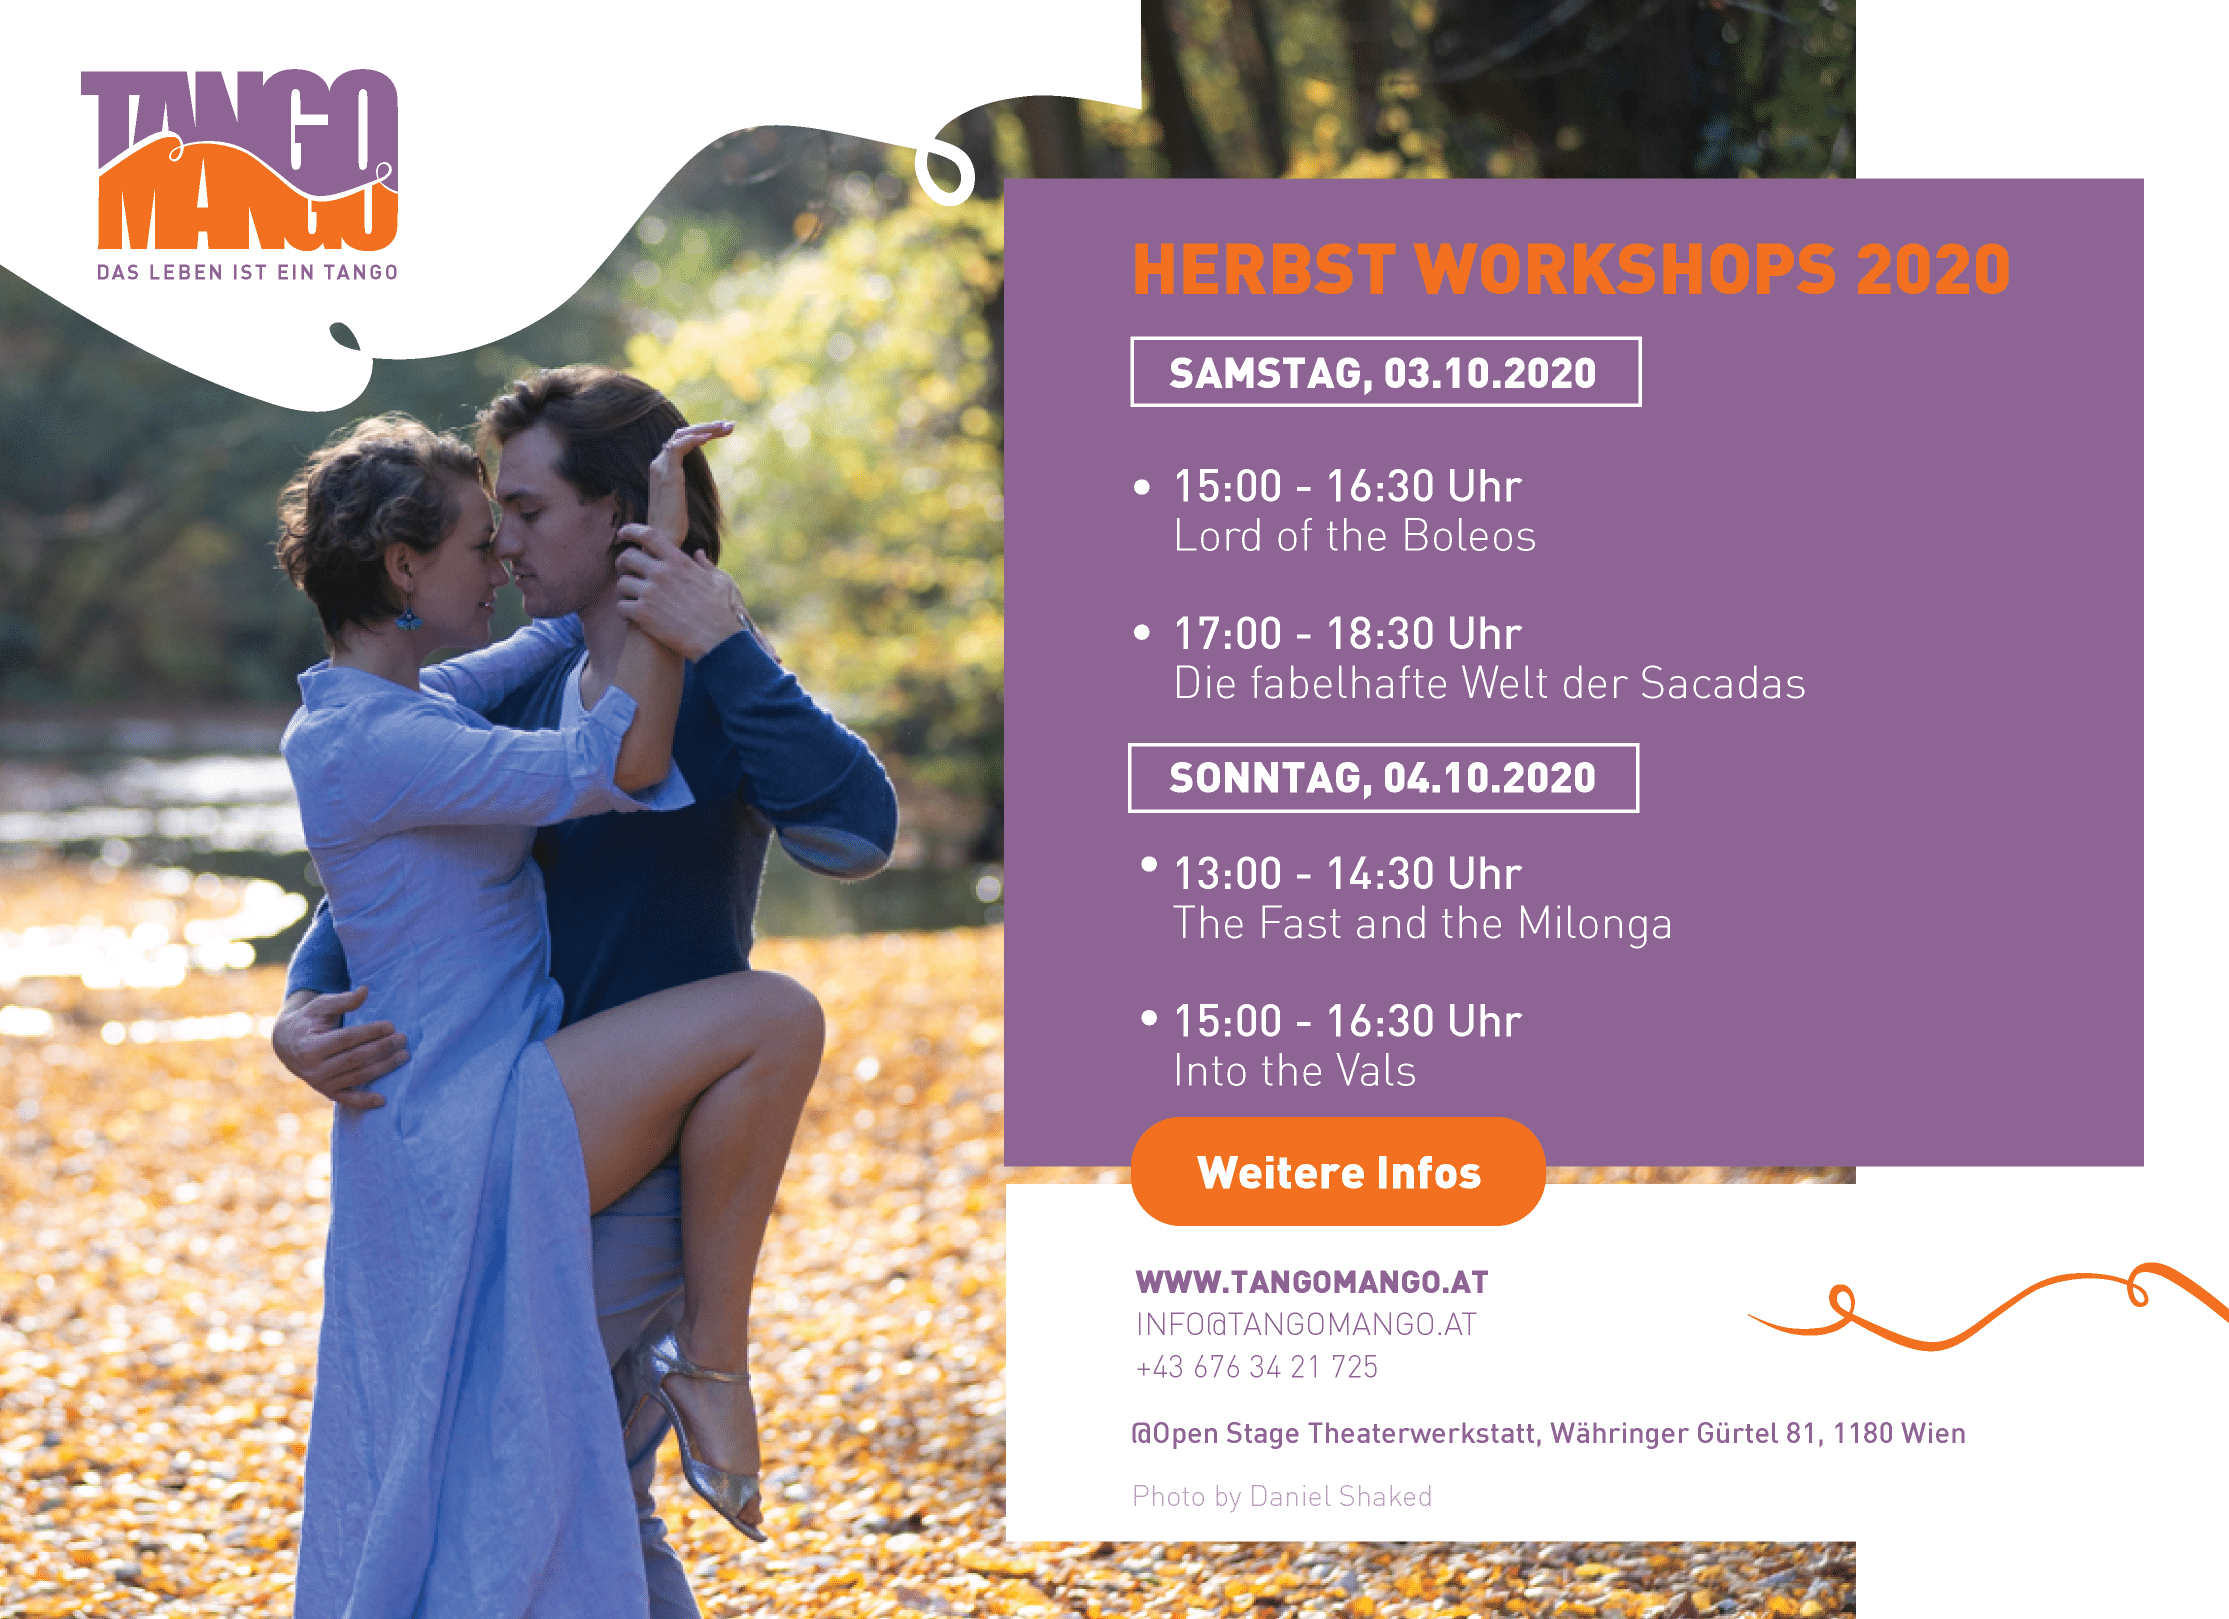 Tango Herbst Workshops 2020